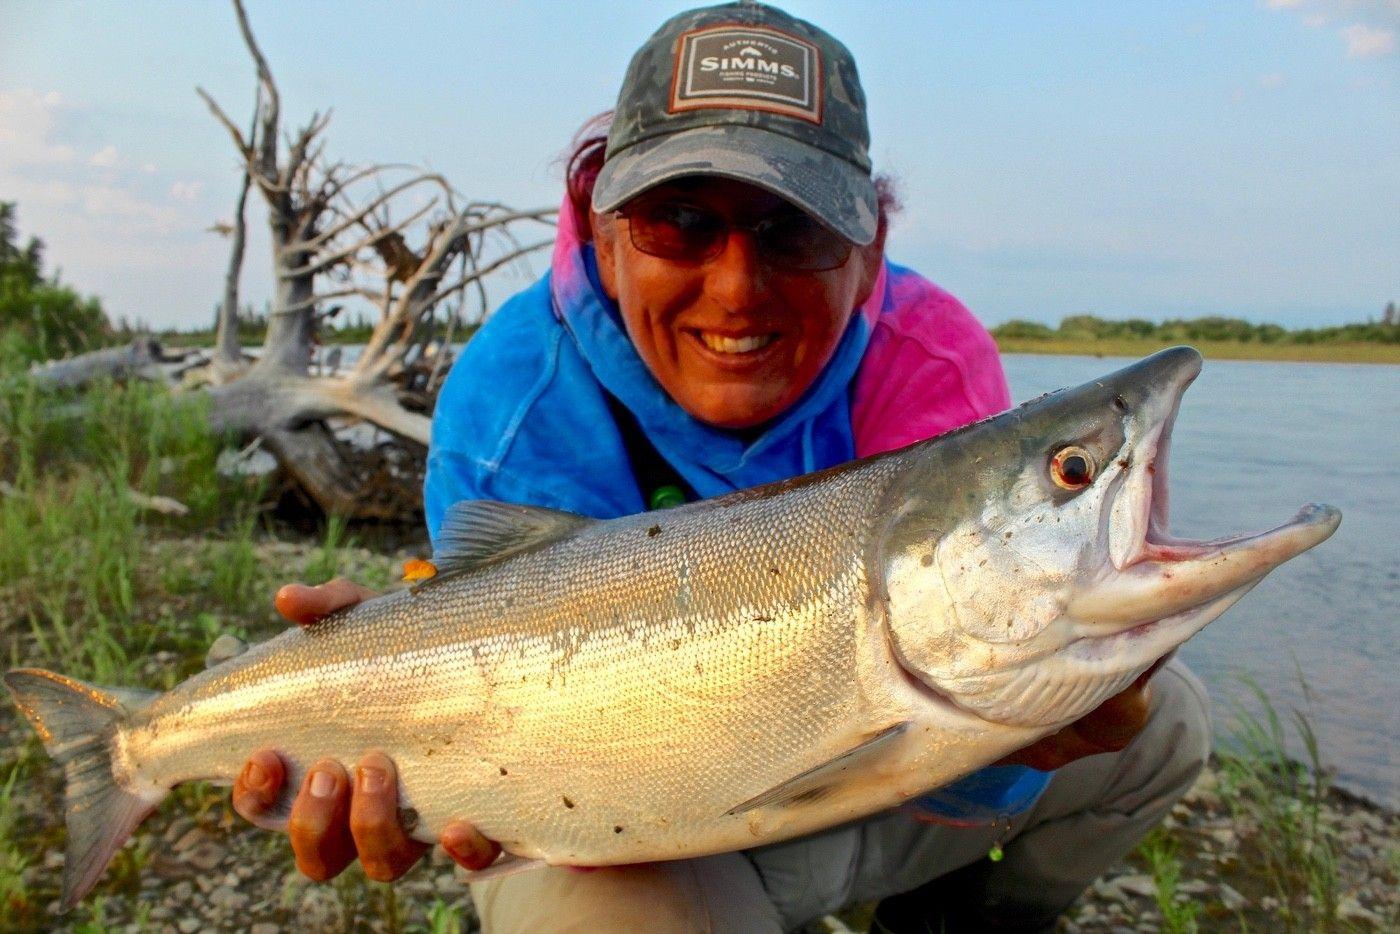 A chrome-bright sockeye salmon.